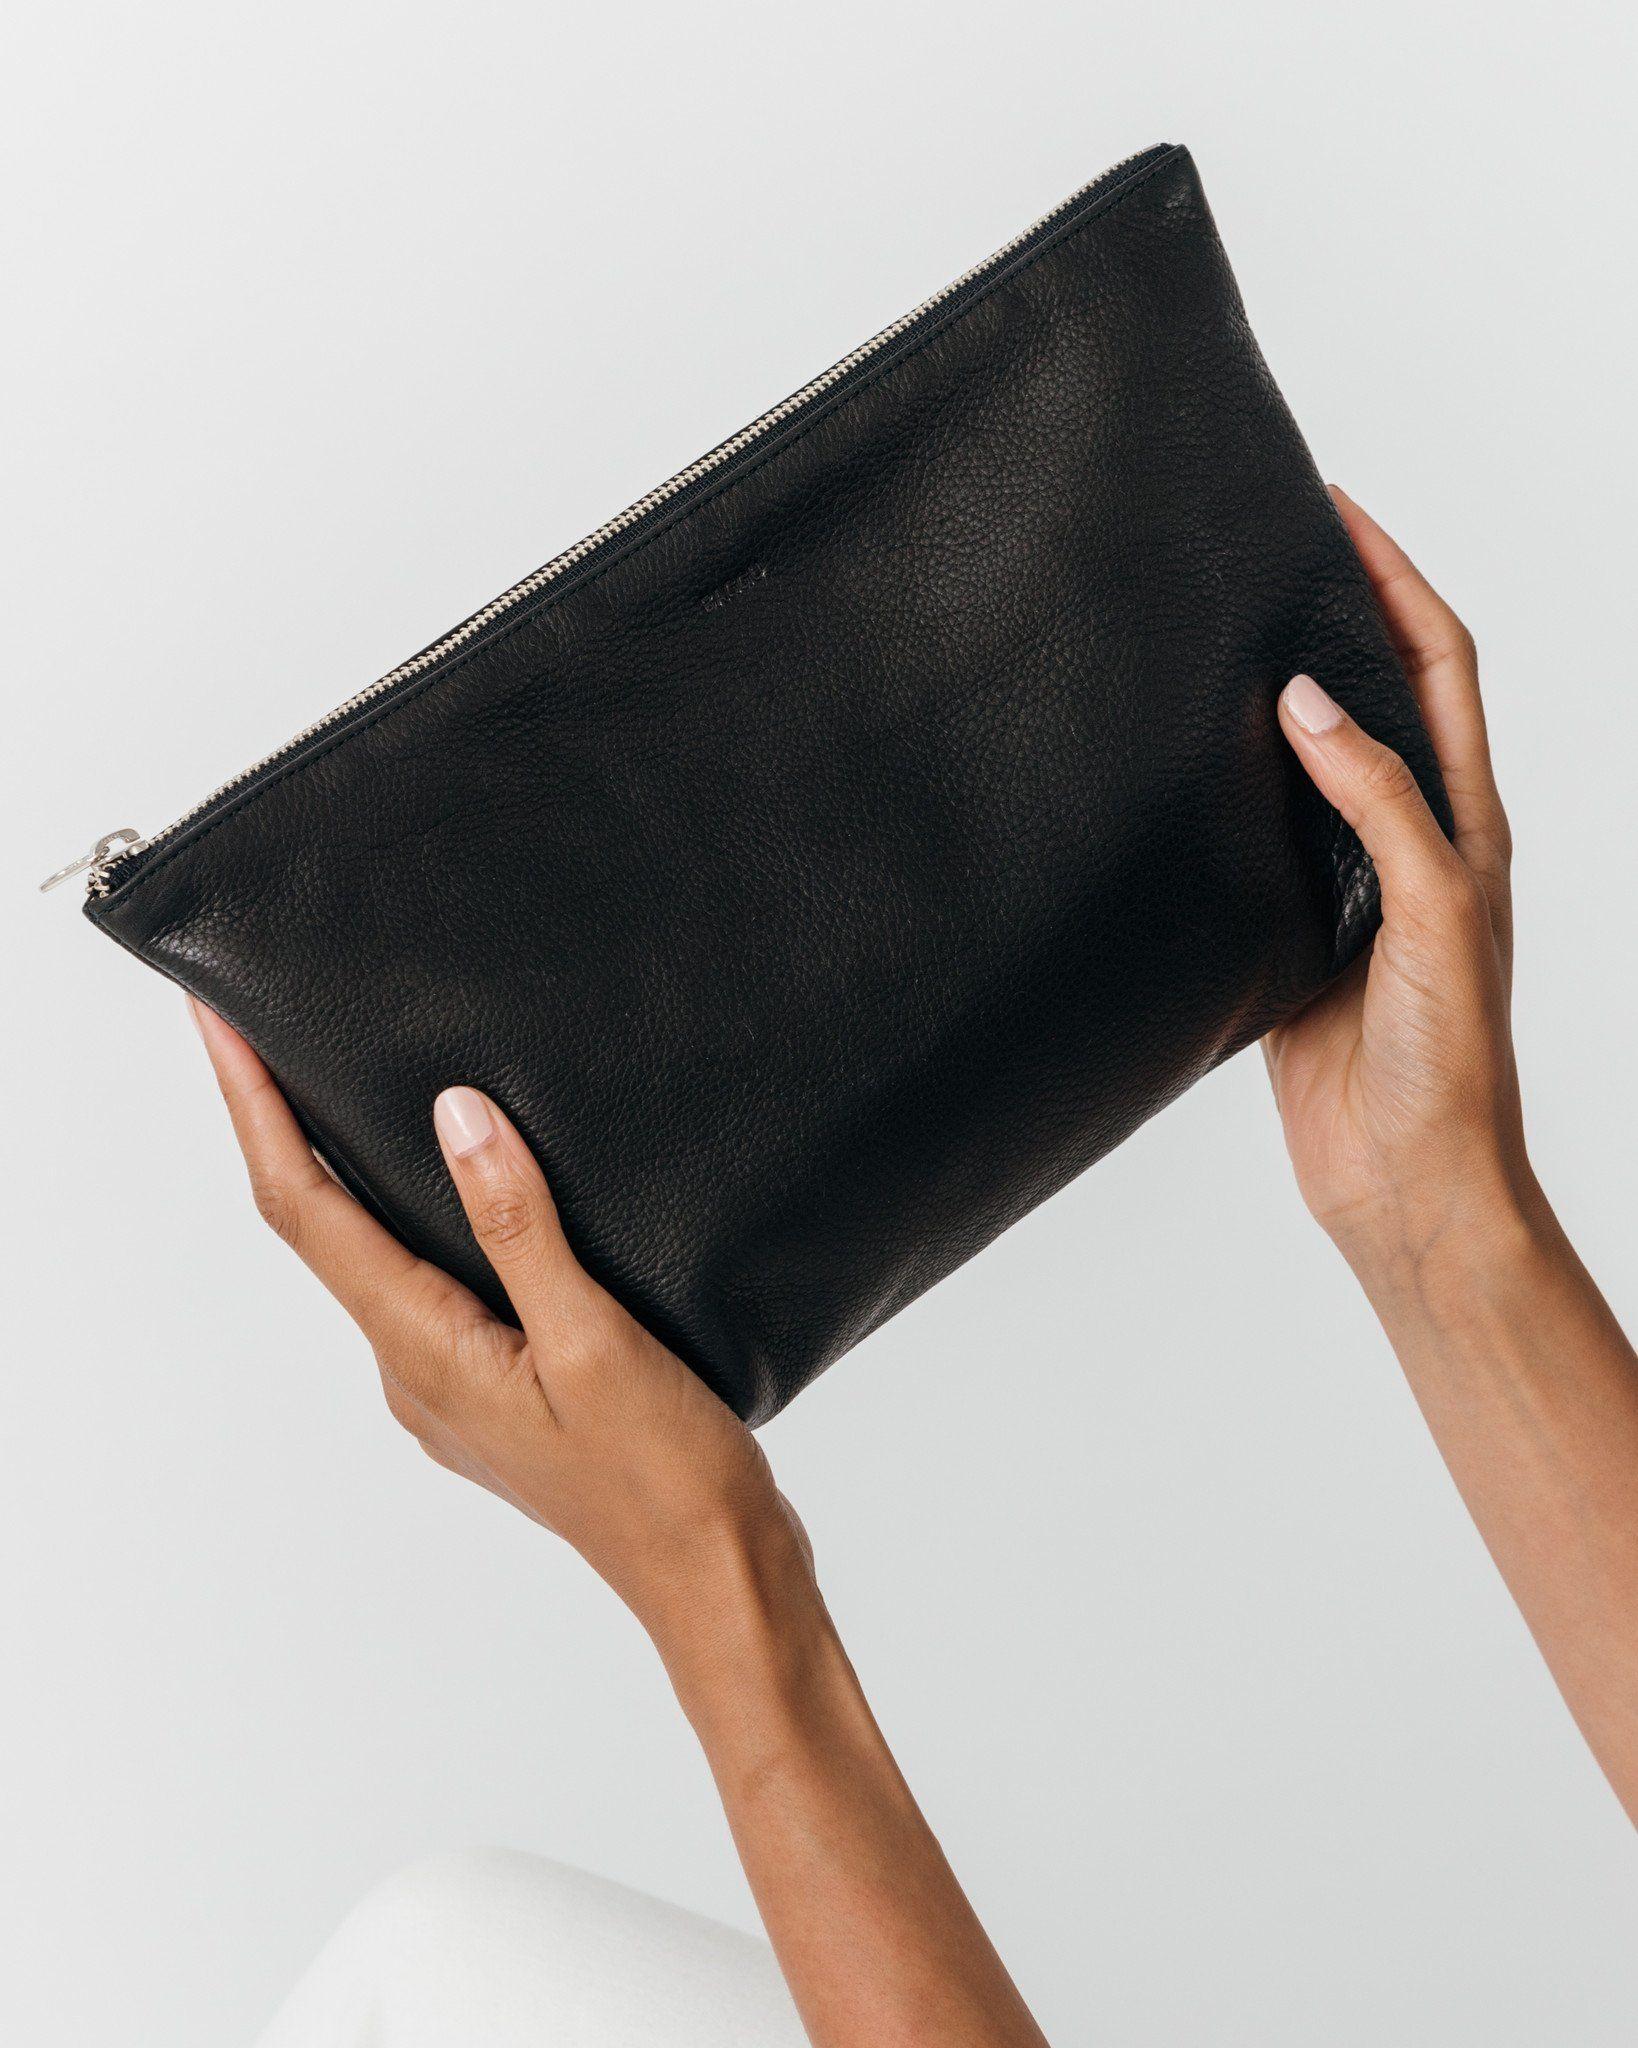 Large Cosmetic Pouch Black – BAGGU | Baggu leather